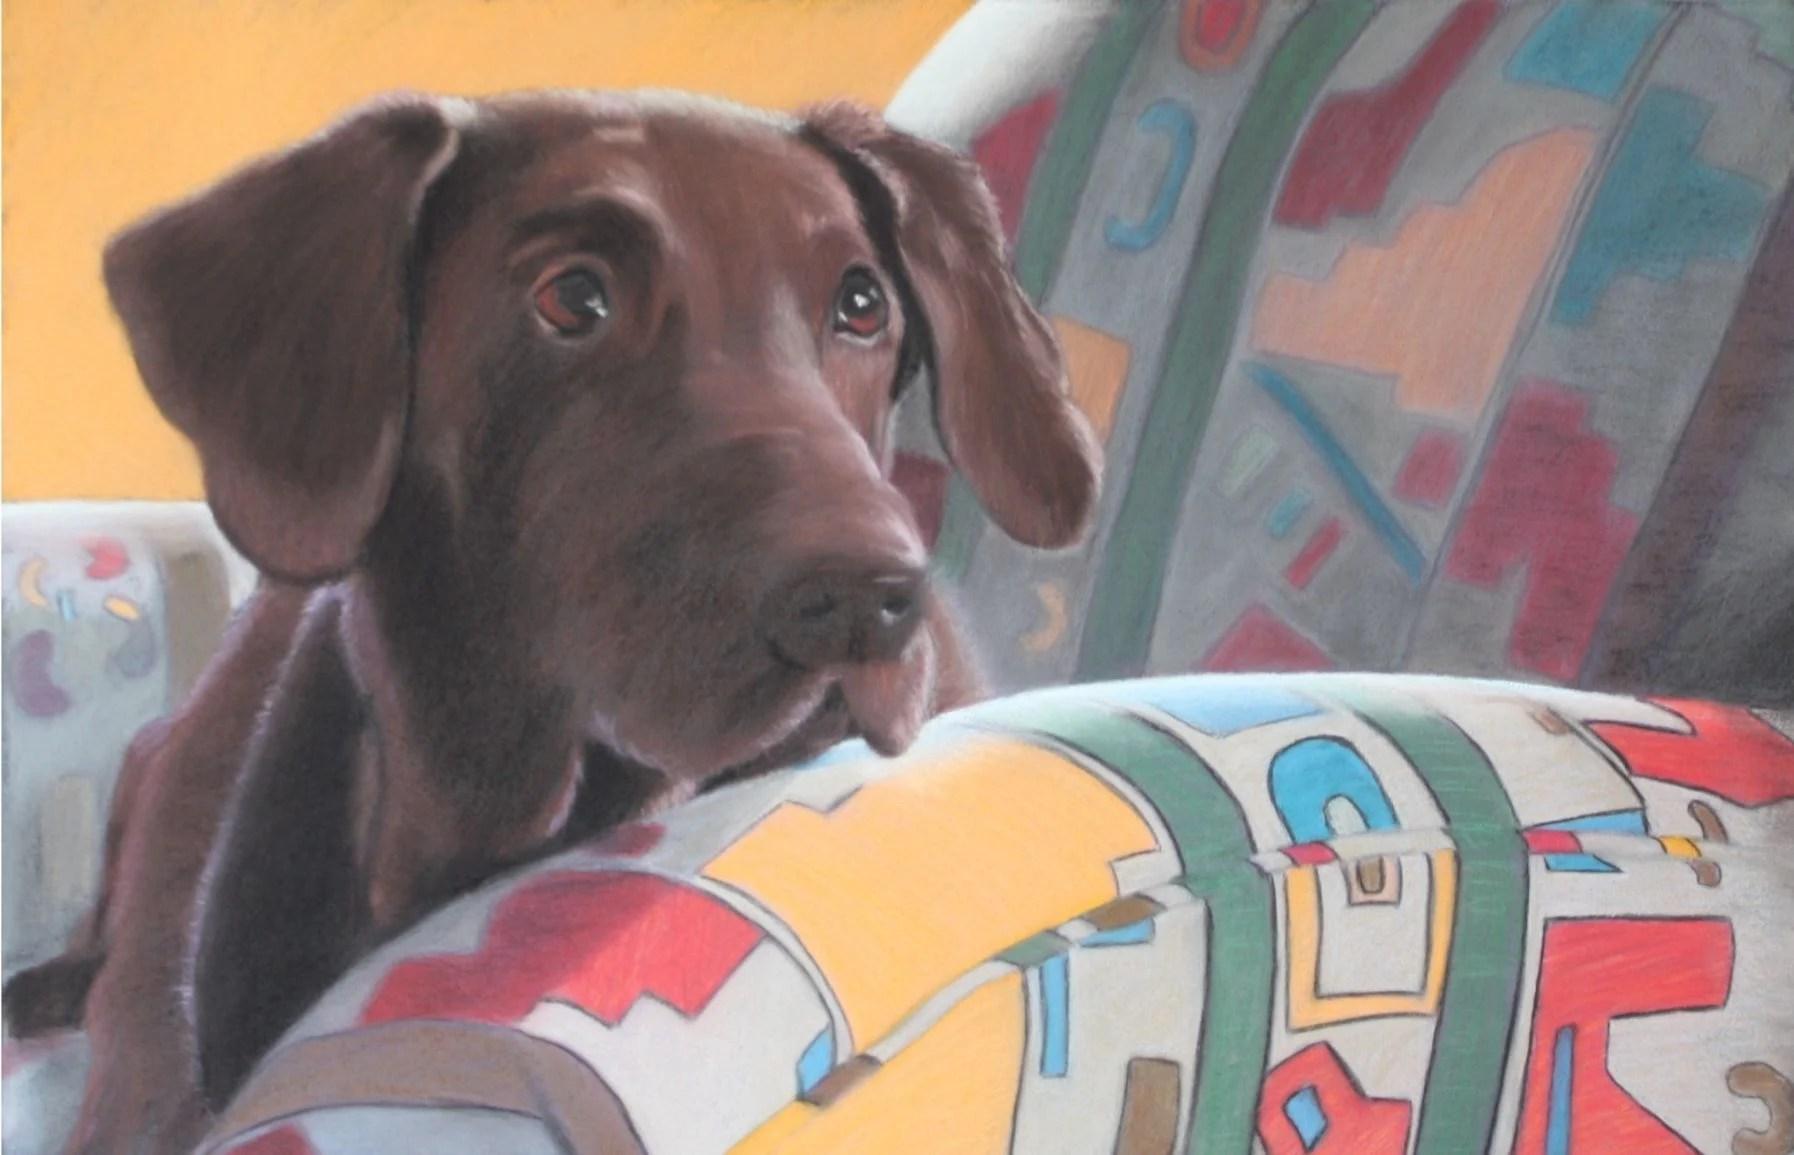 Fullsize Of Aaron Rodgers Dog